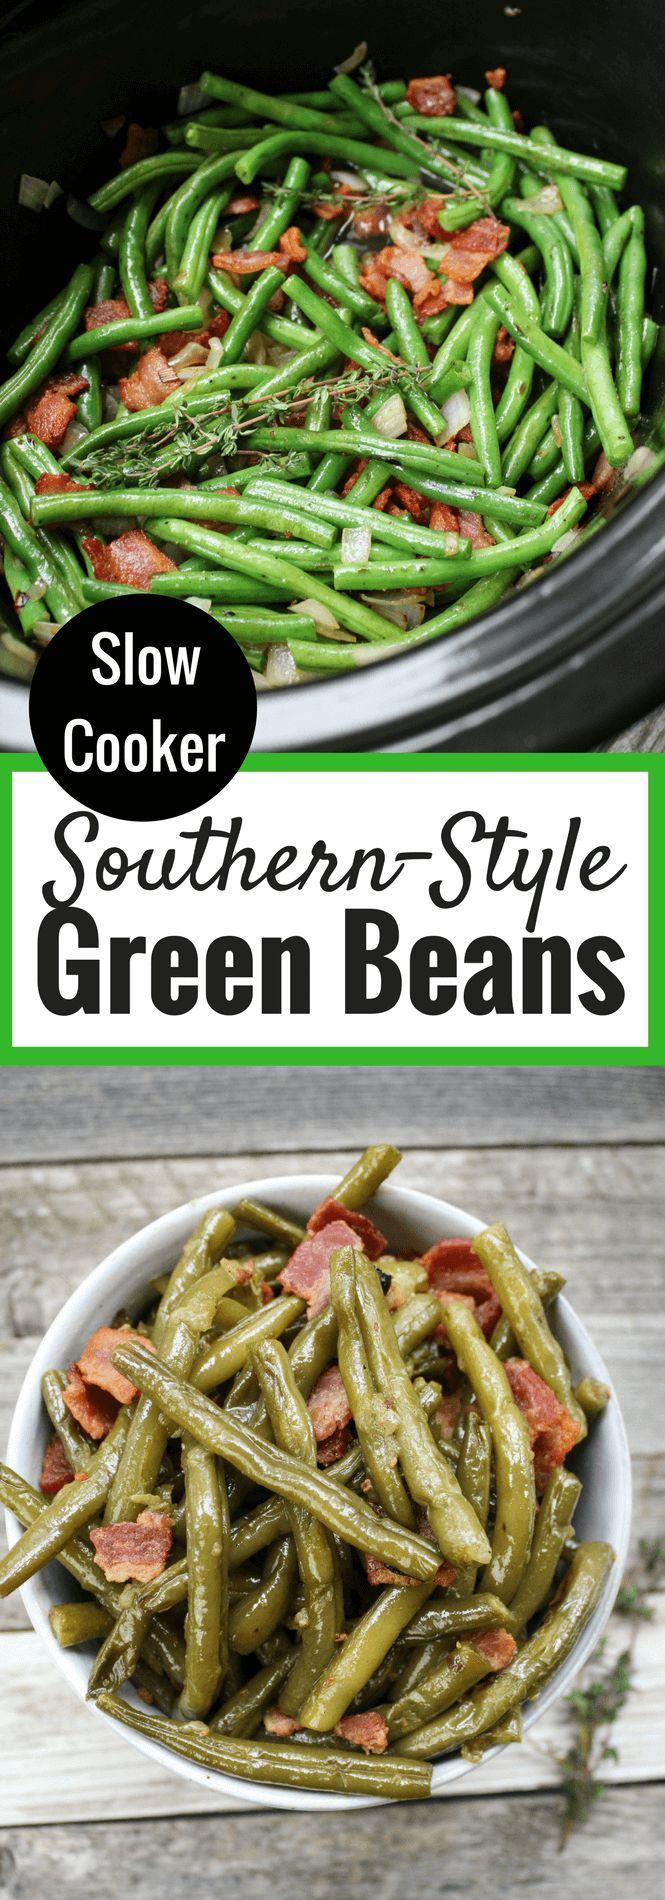 Crockpot Southern-Style Green Beans #thanksiving side dish #crockpot